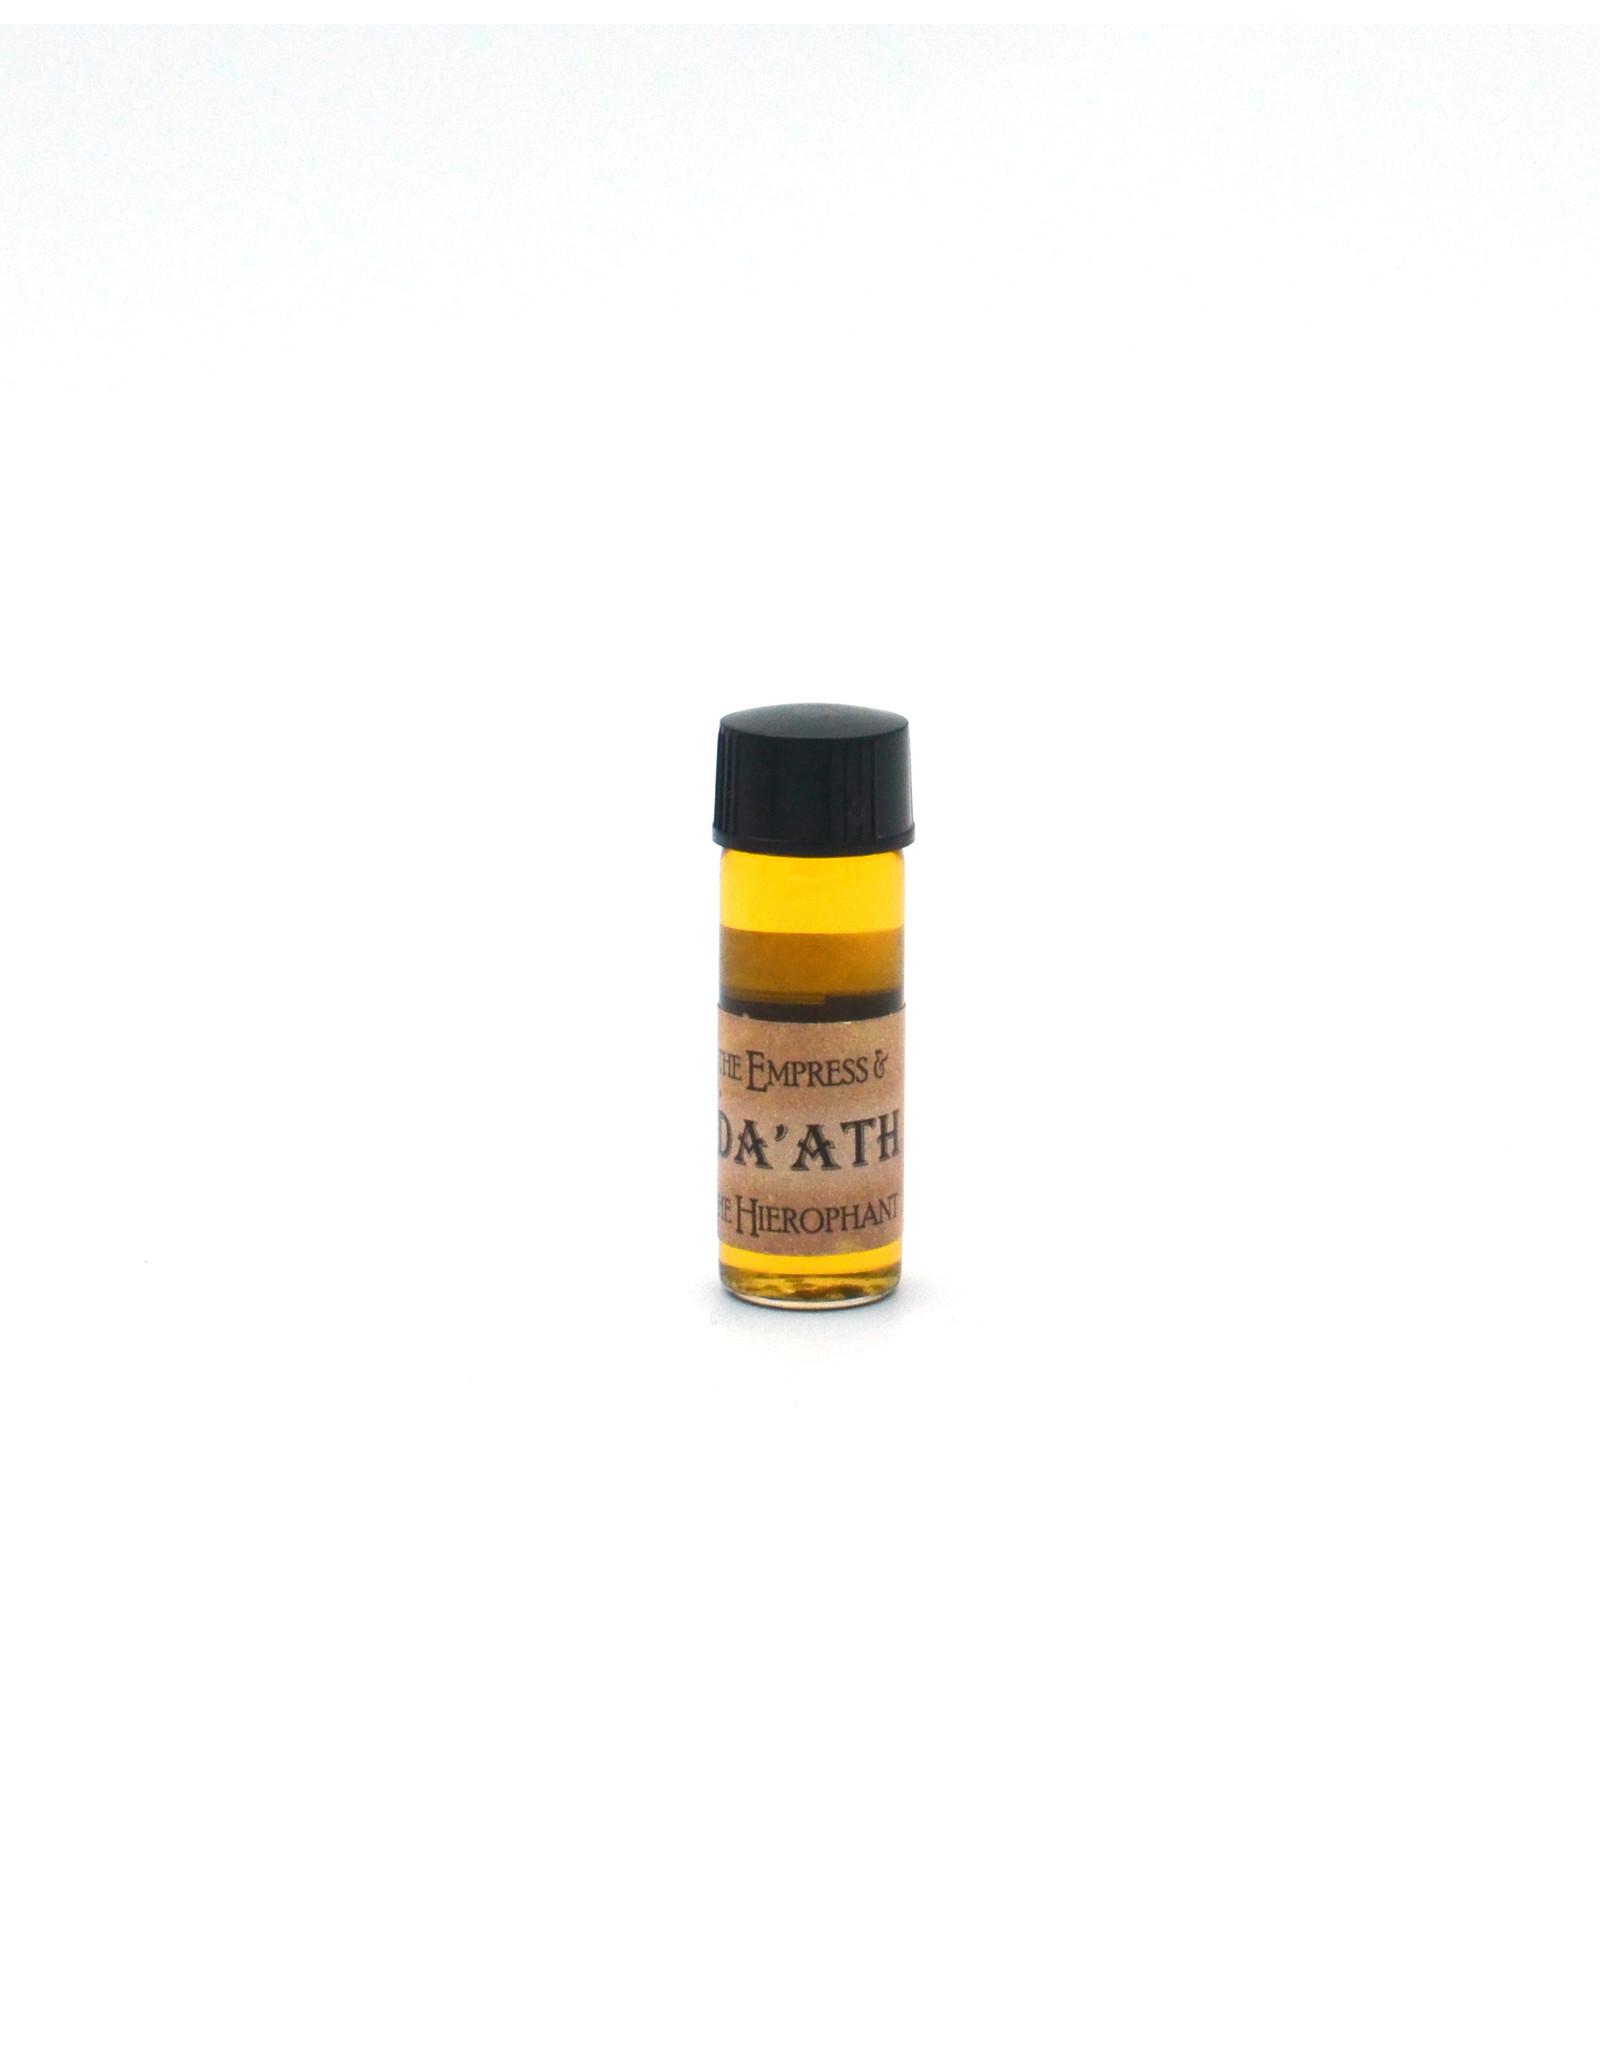 Da'ath Magickal Oil 1 Dram Bottle